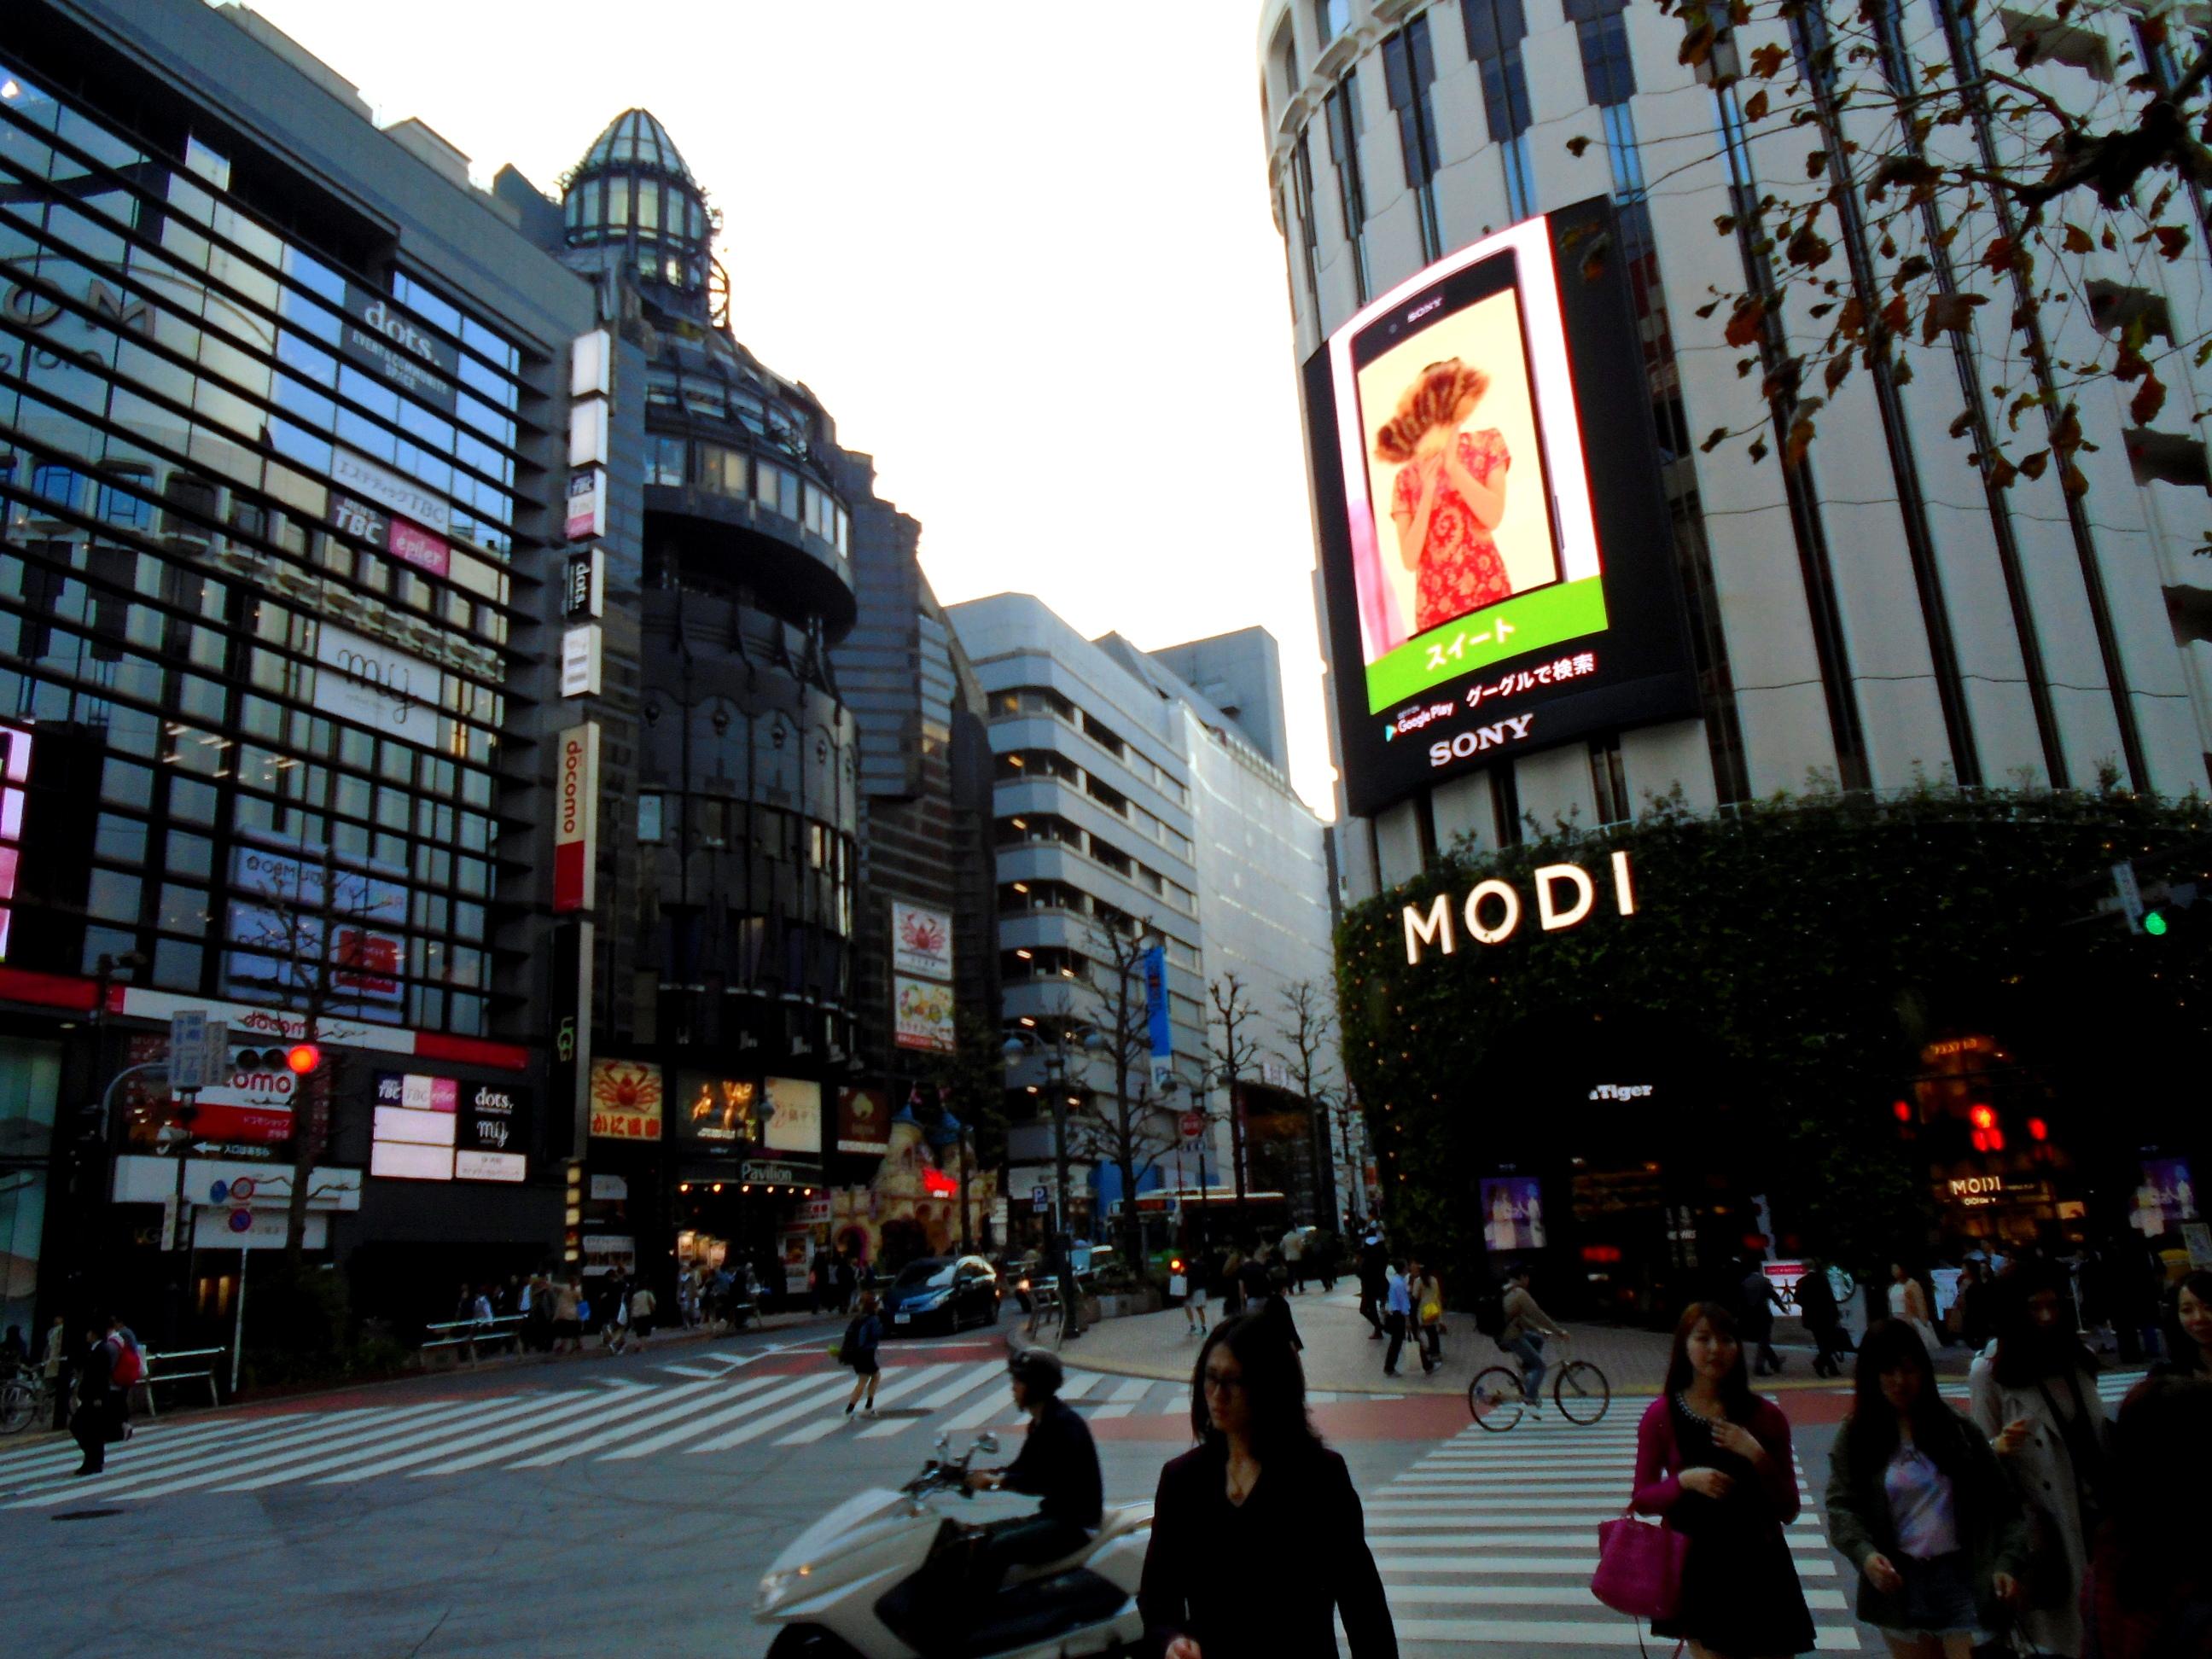 MODI shopping complex Shibuya